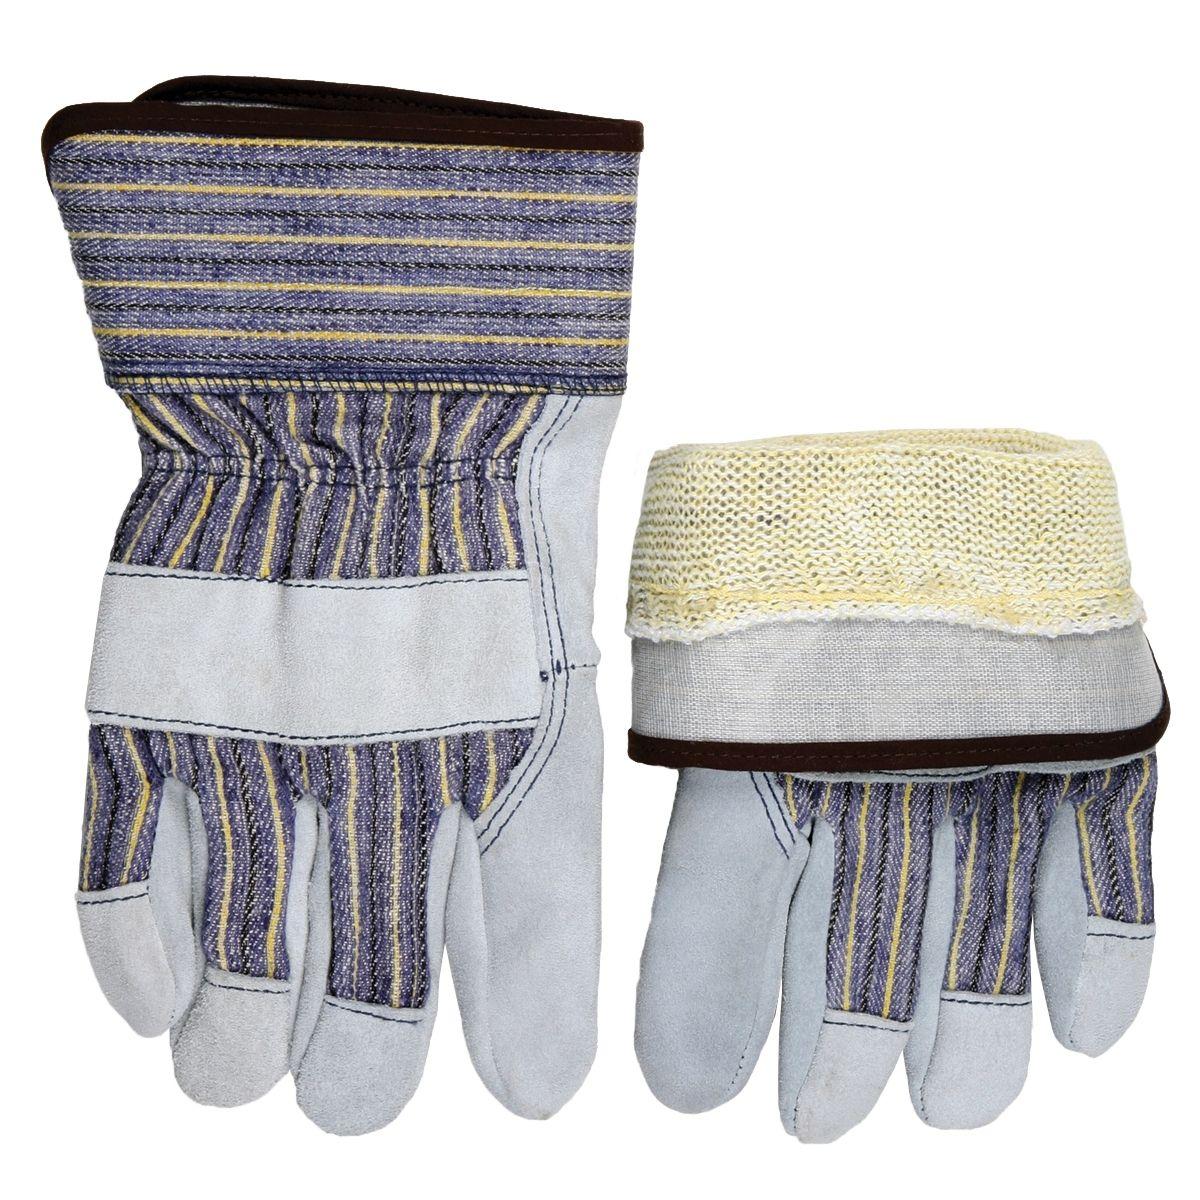 Pin on Work Gloves